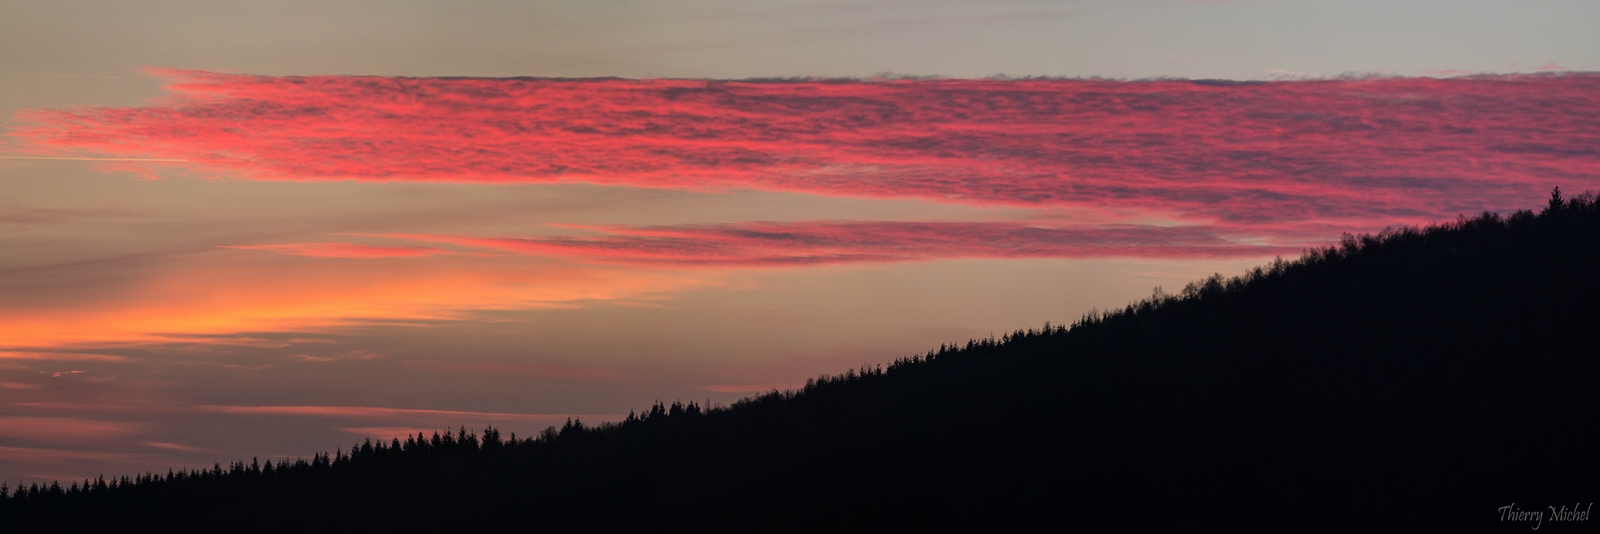 Panorama-sans-titre1copy-comp [1600x1200].jpg